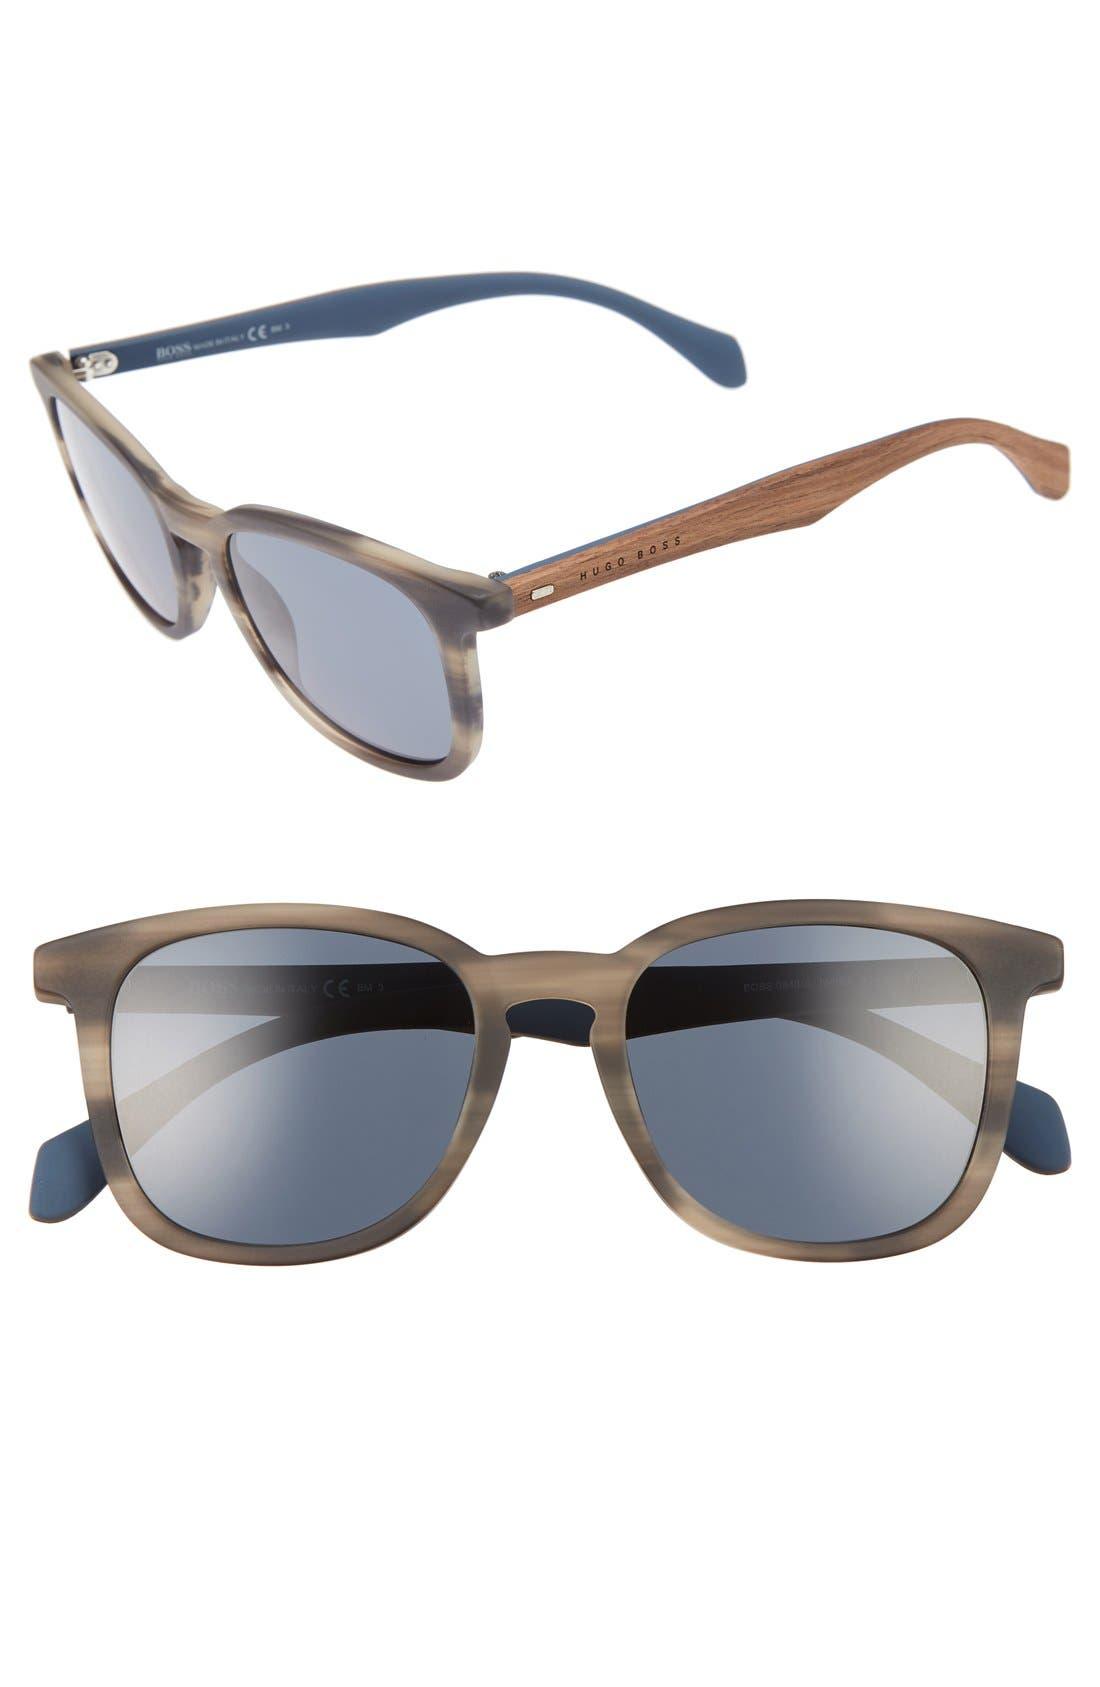 843/S 52mm Sunglasses,                             Main thumbnail 1, color,                             Horn Brown/ Blue